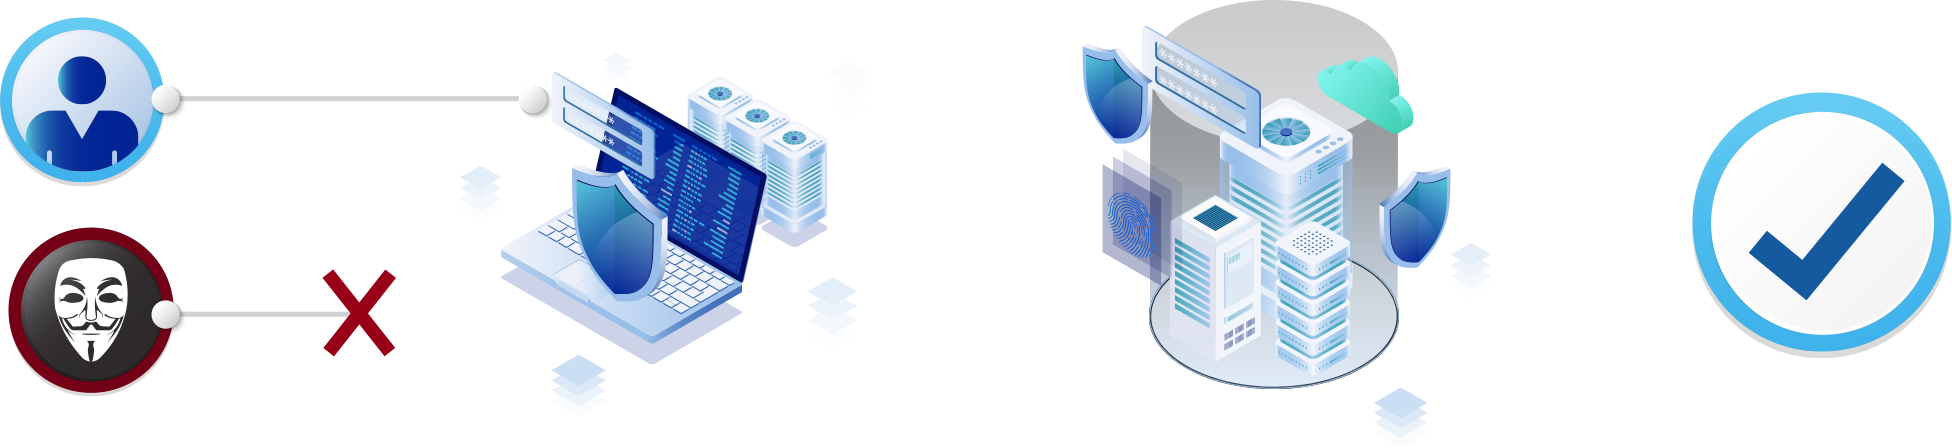 cyber_shield_technology